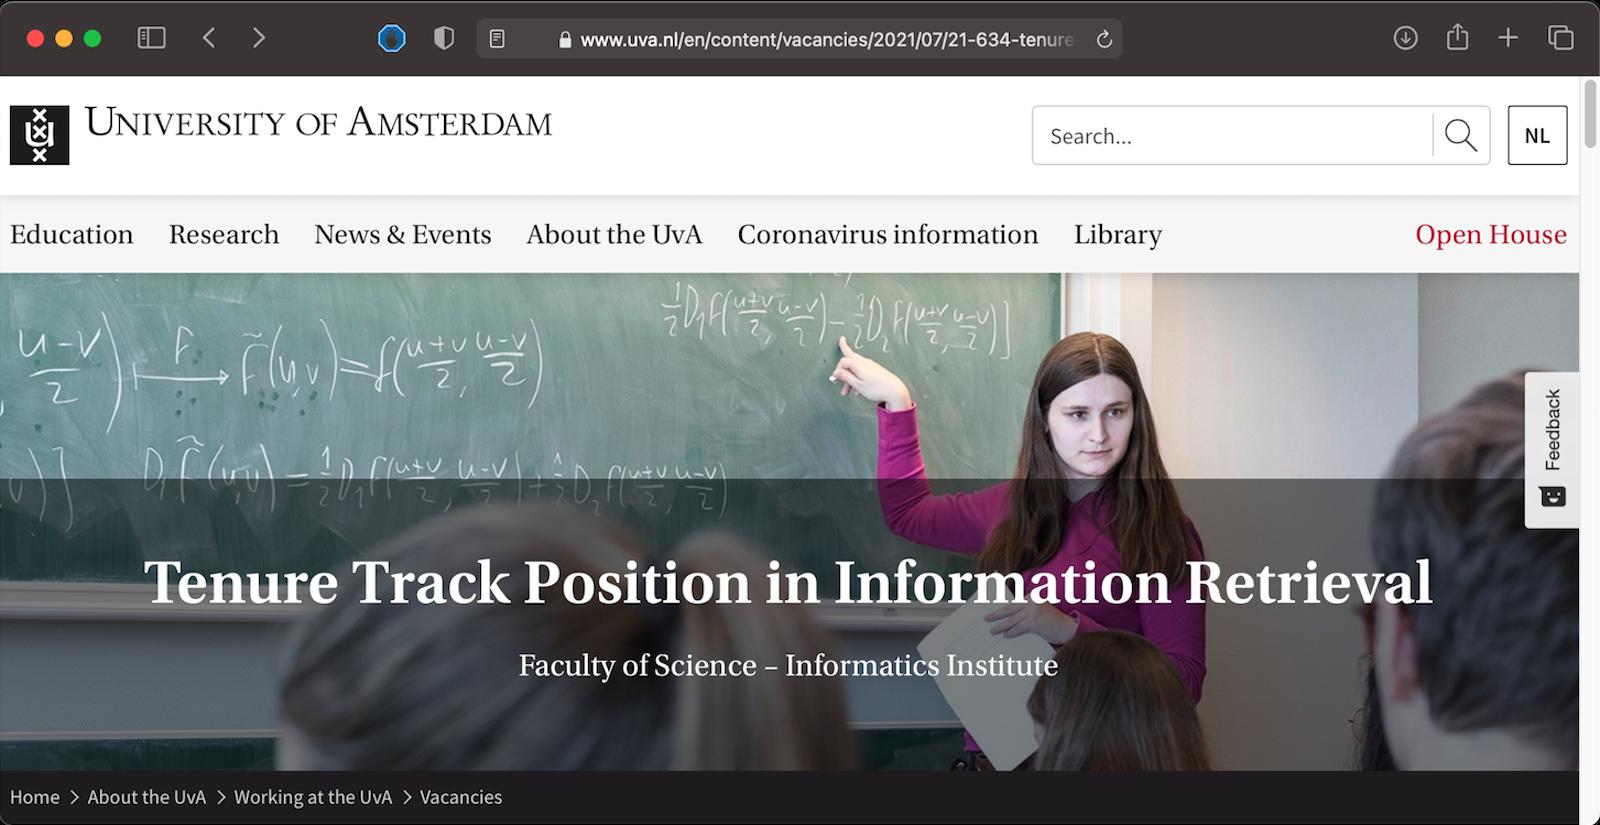 Tenure-track Position in Information Retrieval